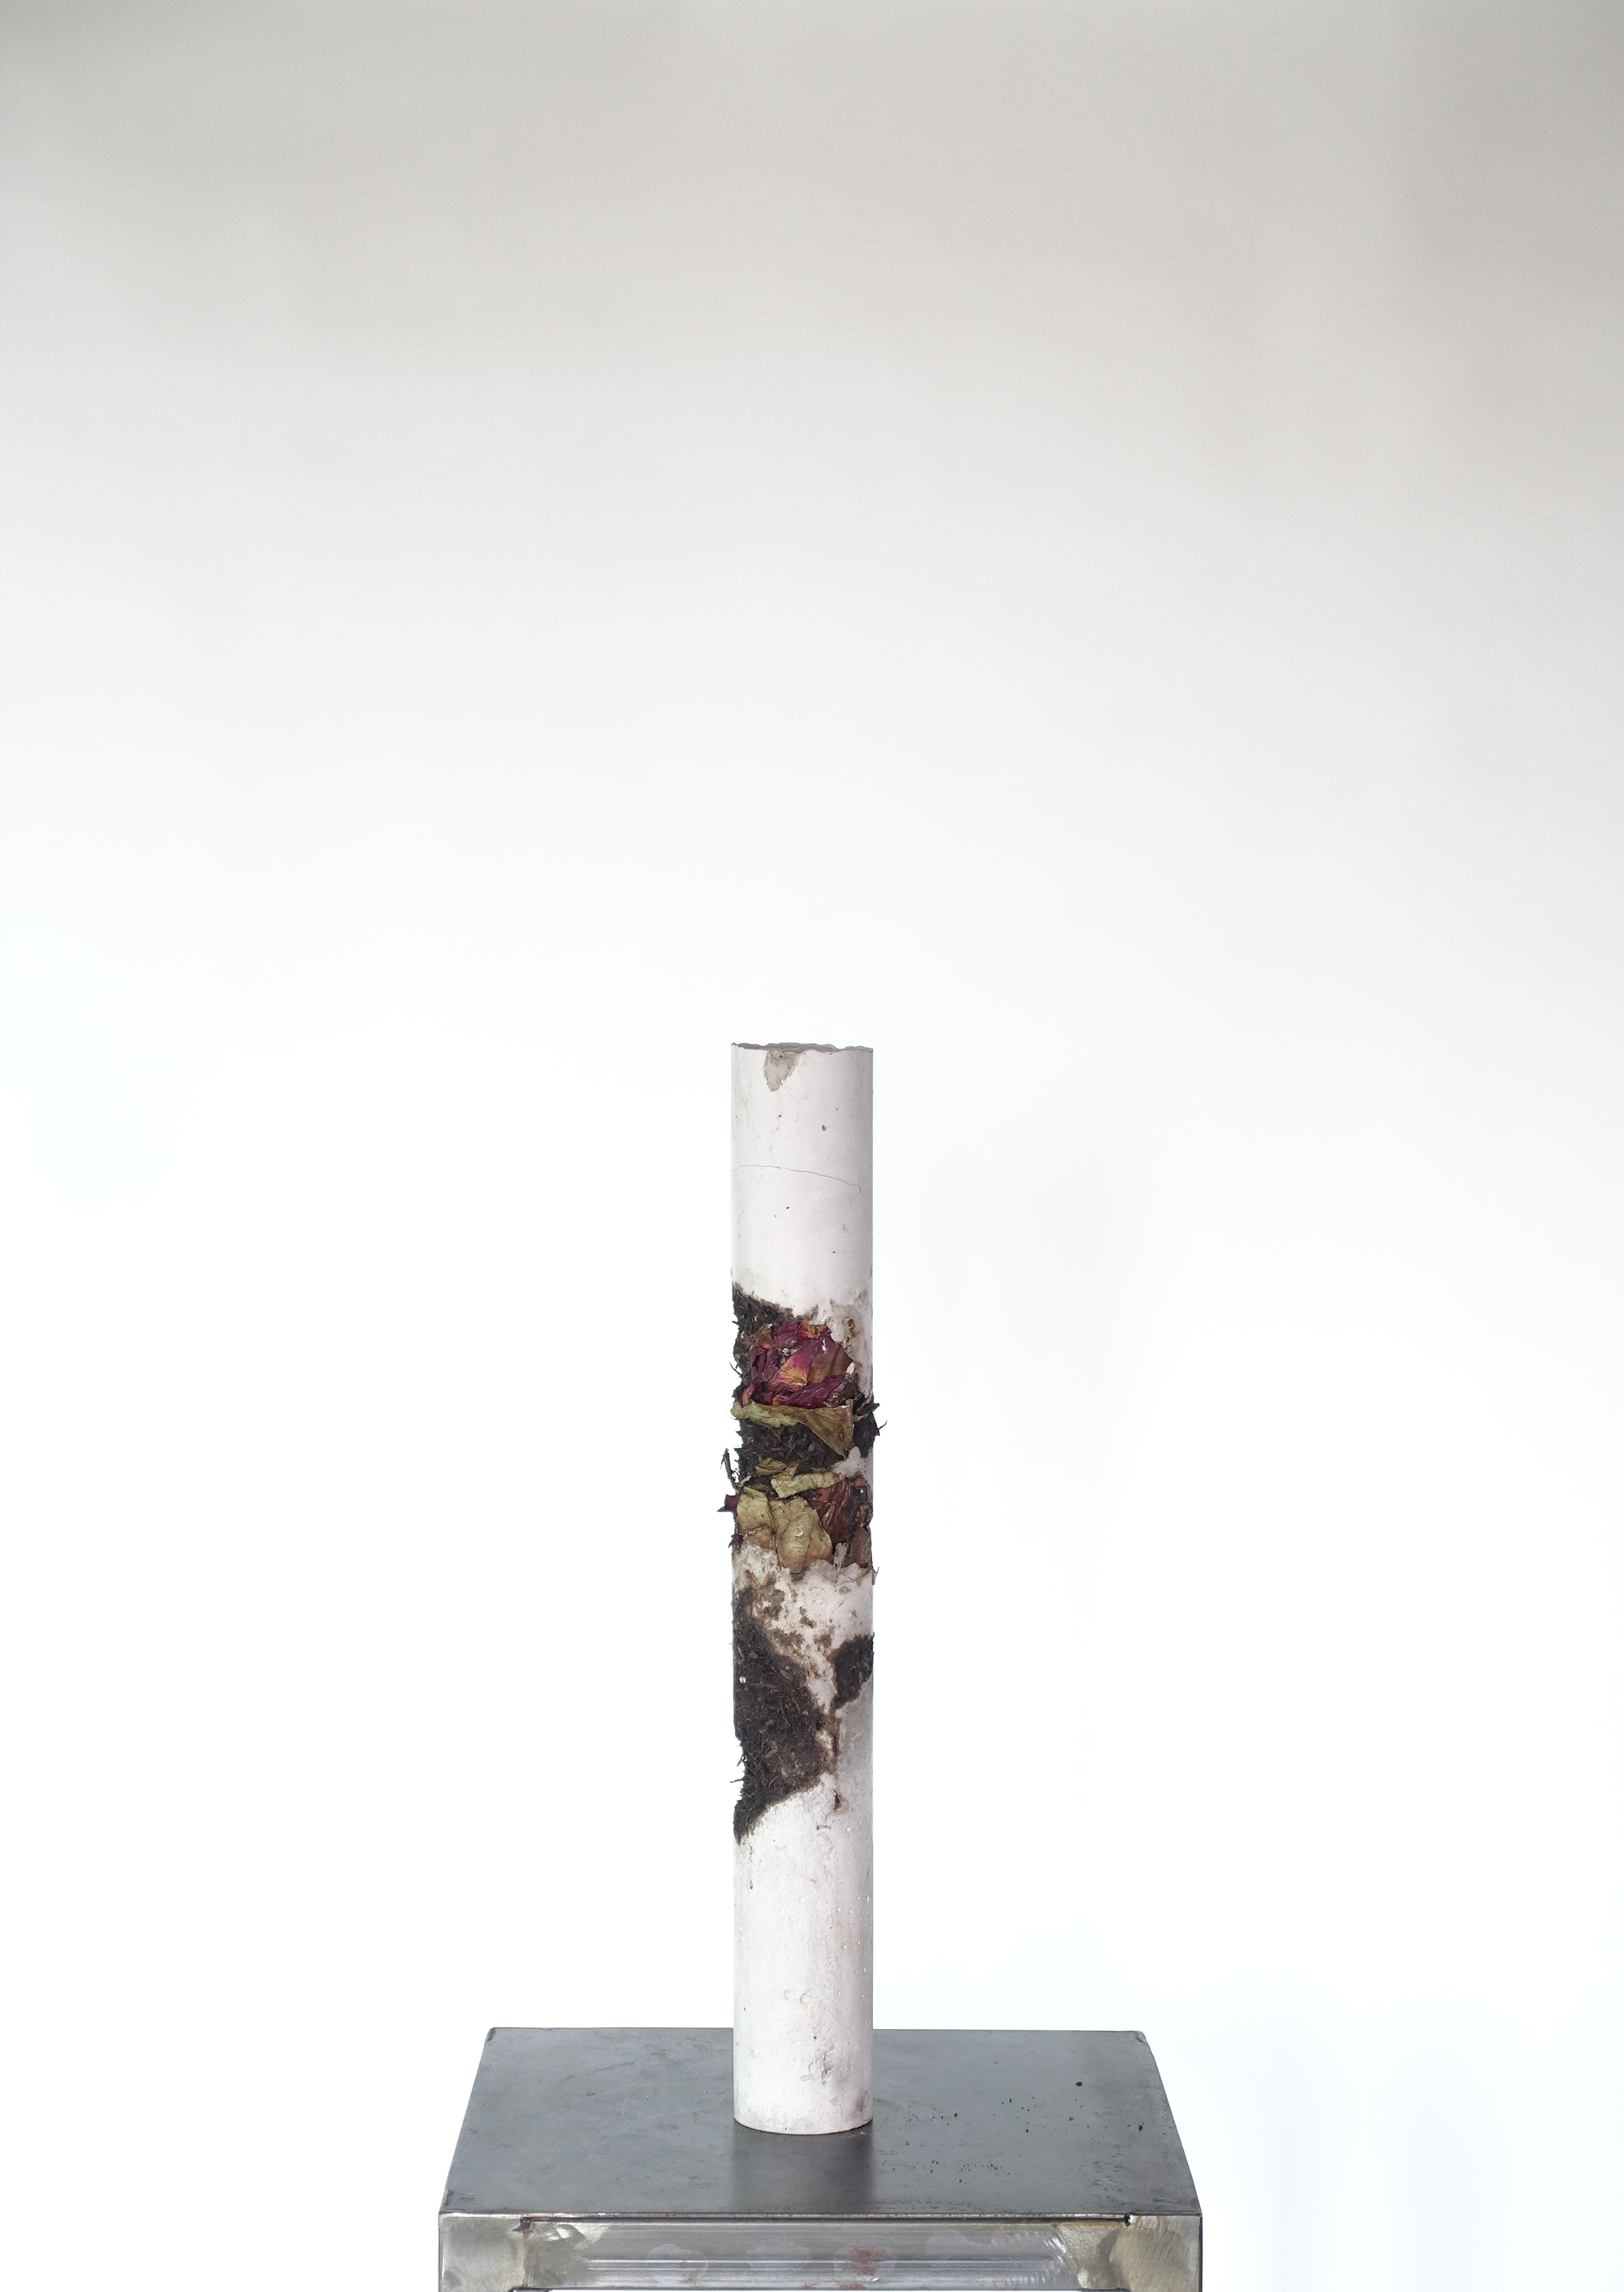 Still Life #3 Rose-Michele Tiberio.JPG